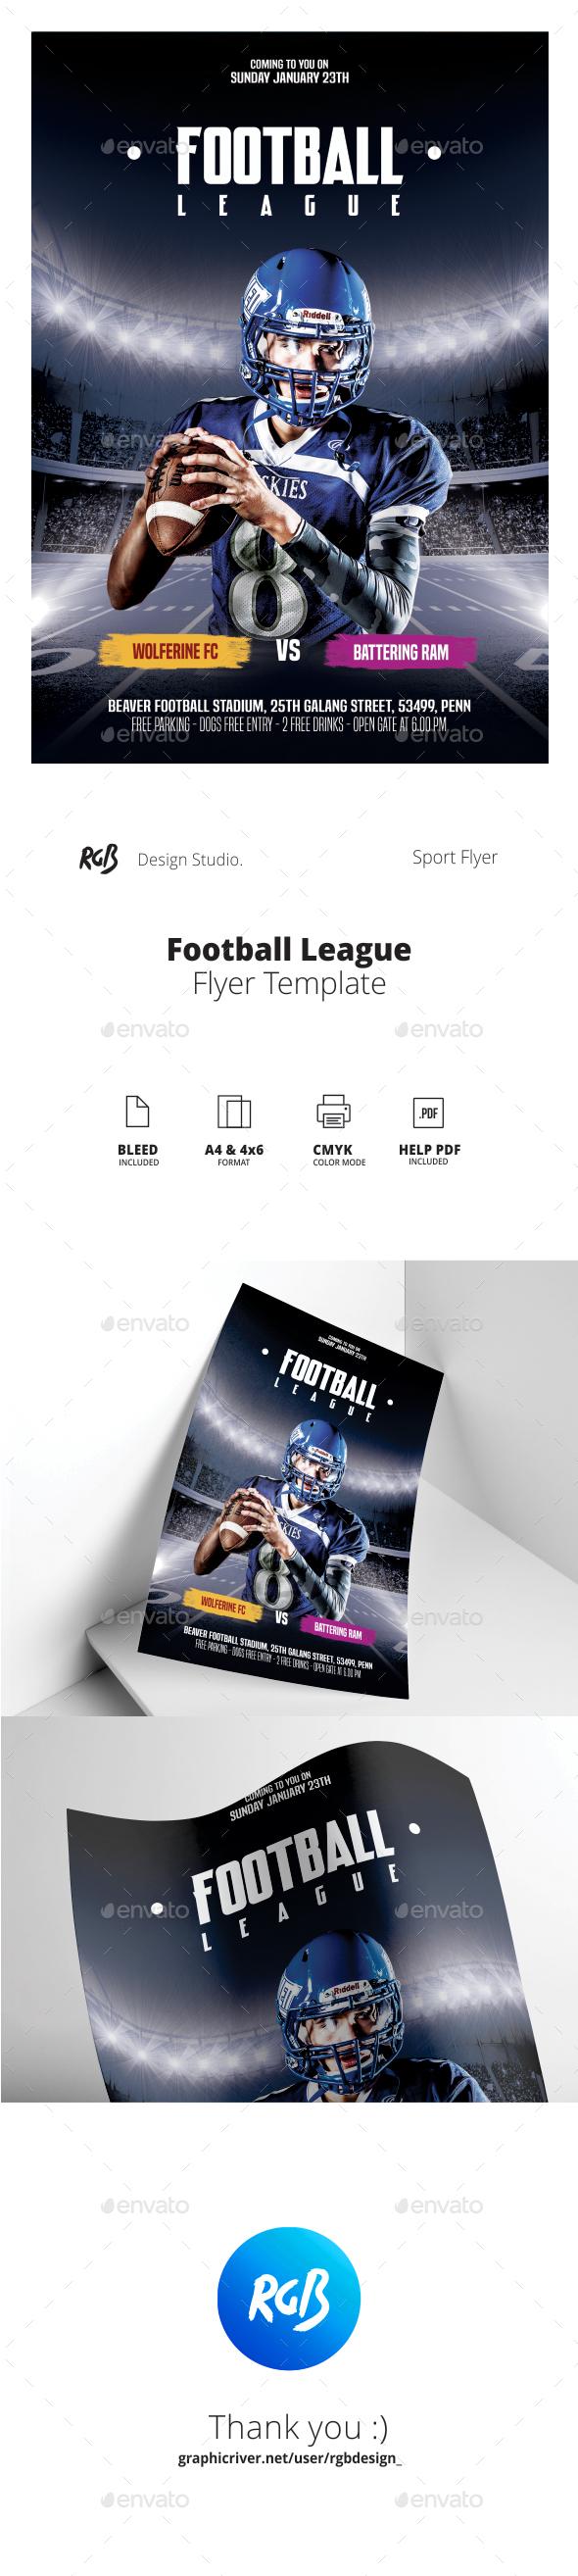 Football League Flyer - Sports Events